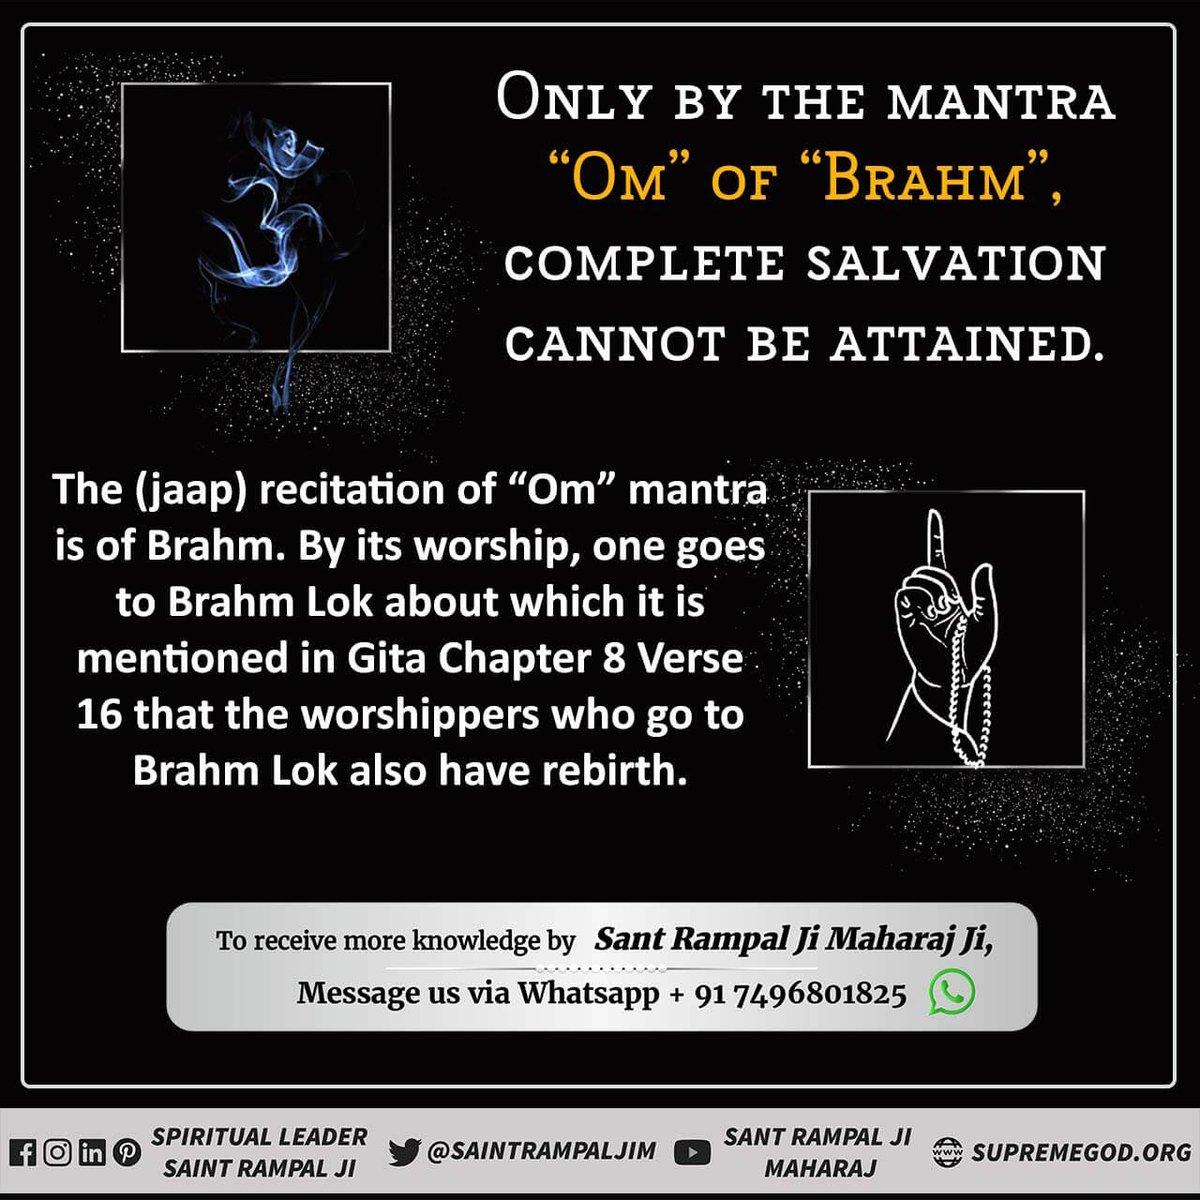 #SaintRampalJi #GodKabir #Kabir #shree #krishna #bhakti #india #om #omnamahshivay #mahadev #mahakal #bholenath #mantras #mudra #meditation #kundaliniawakening #higherself #aum #hindu #god #chanting #gita #bhagavadgita #vishnu #lordkrishna #universe [#ॐ_का_रहस्य https://t.co/zVvJBNJTAJ